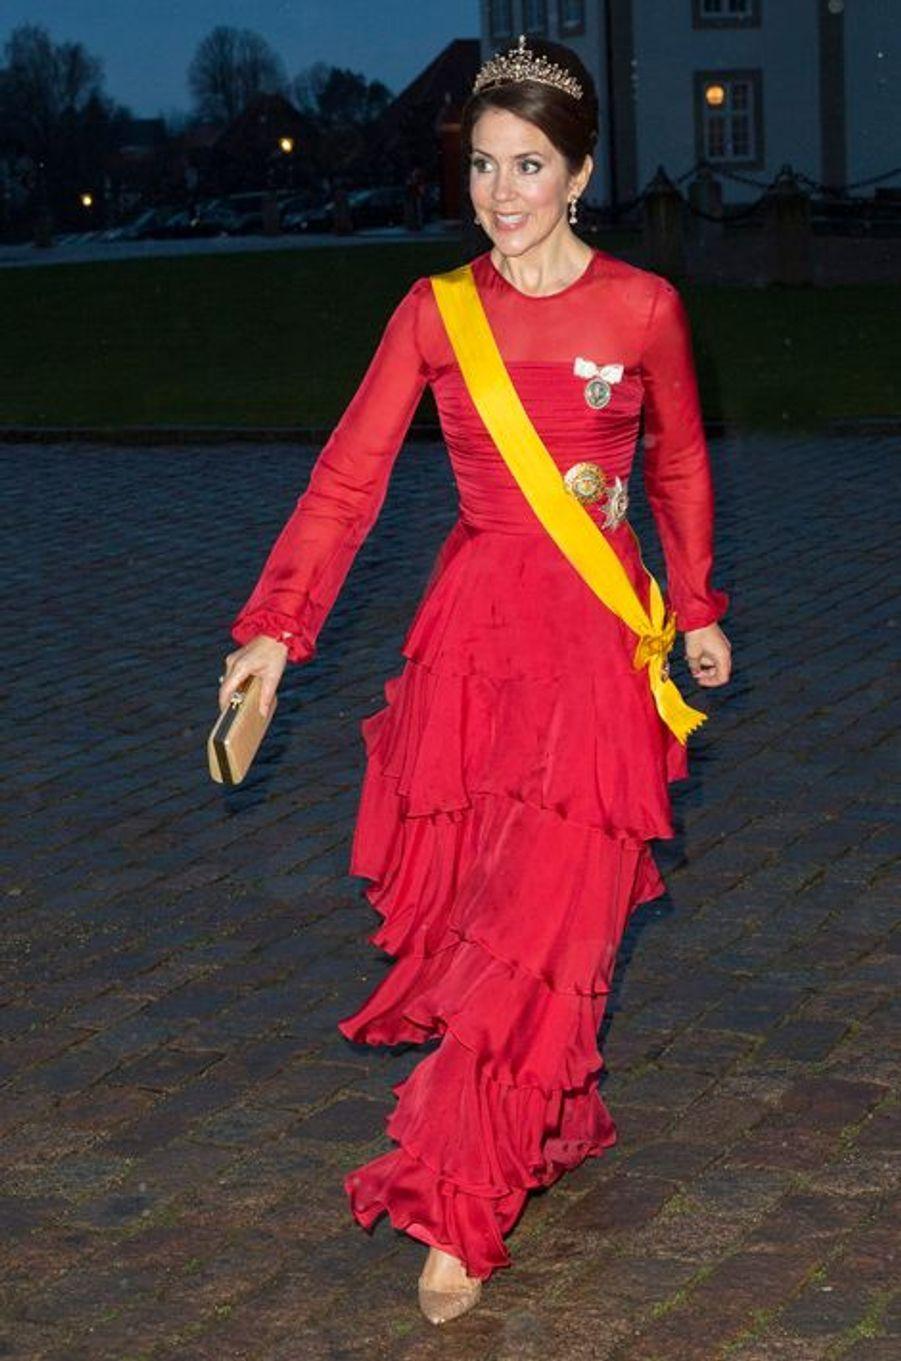 La princesse Mary de Danemark à Fredensborg, le 13 avril 2016